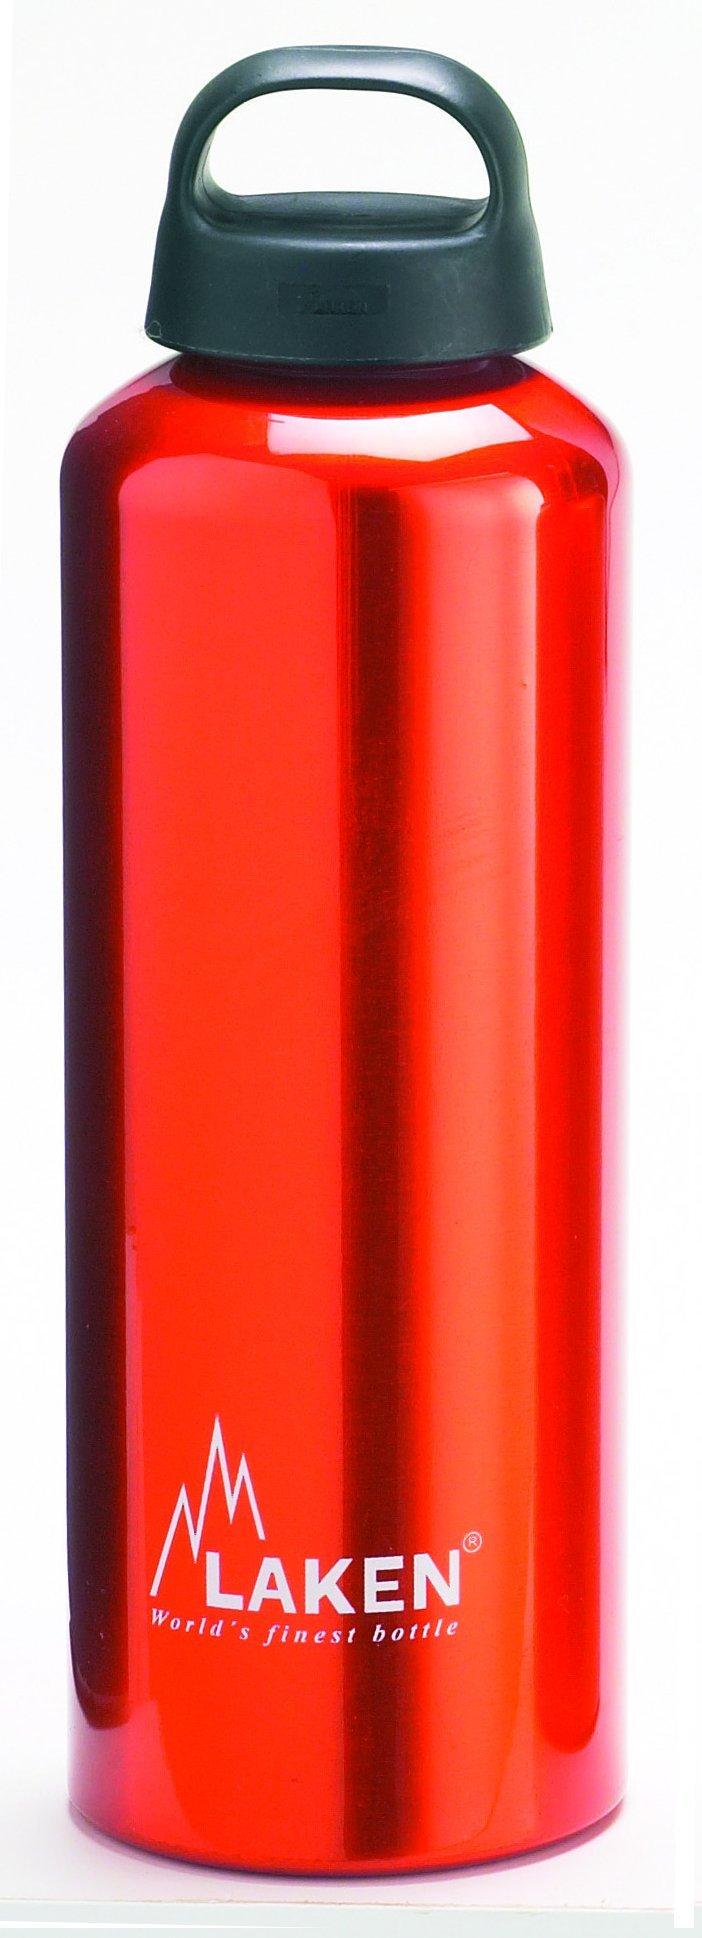 Laken Classic Water Bottle 1 Liter,Orange